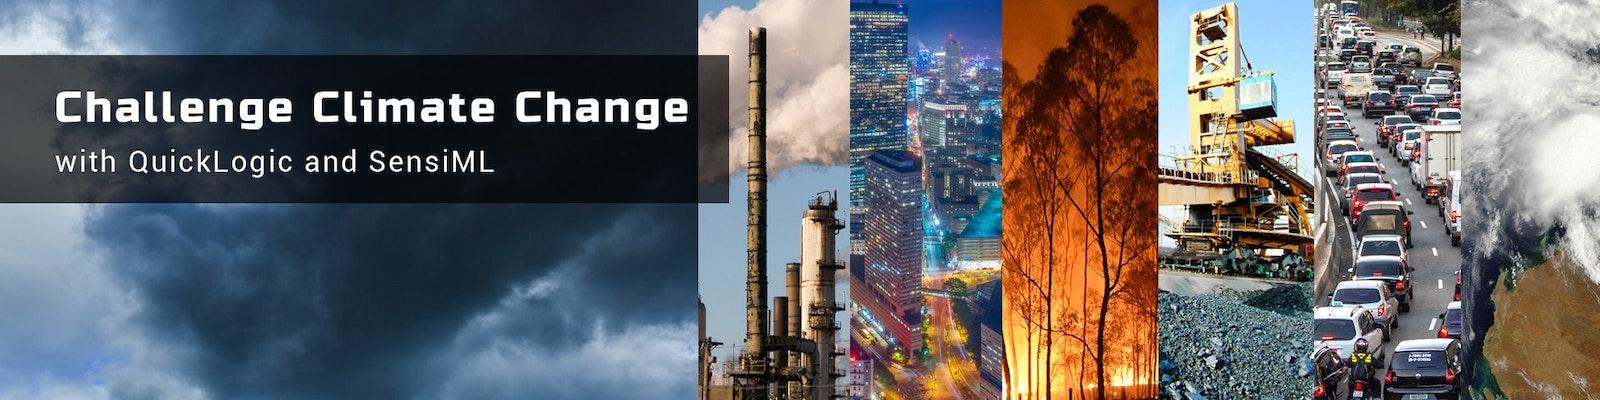 Challenge Climate Change